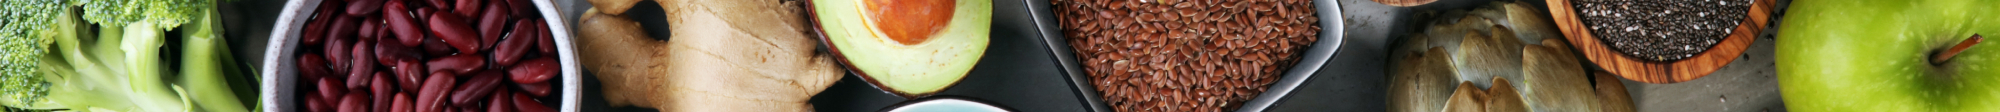 Comprar  productos Conservas | Mixtura Gourmet